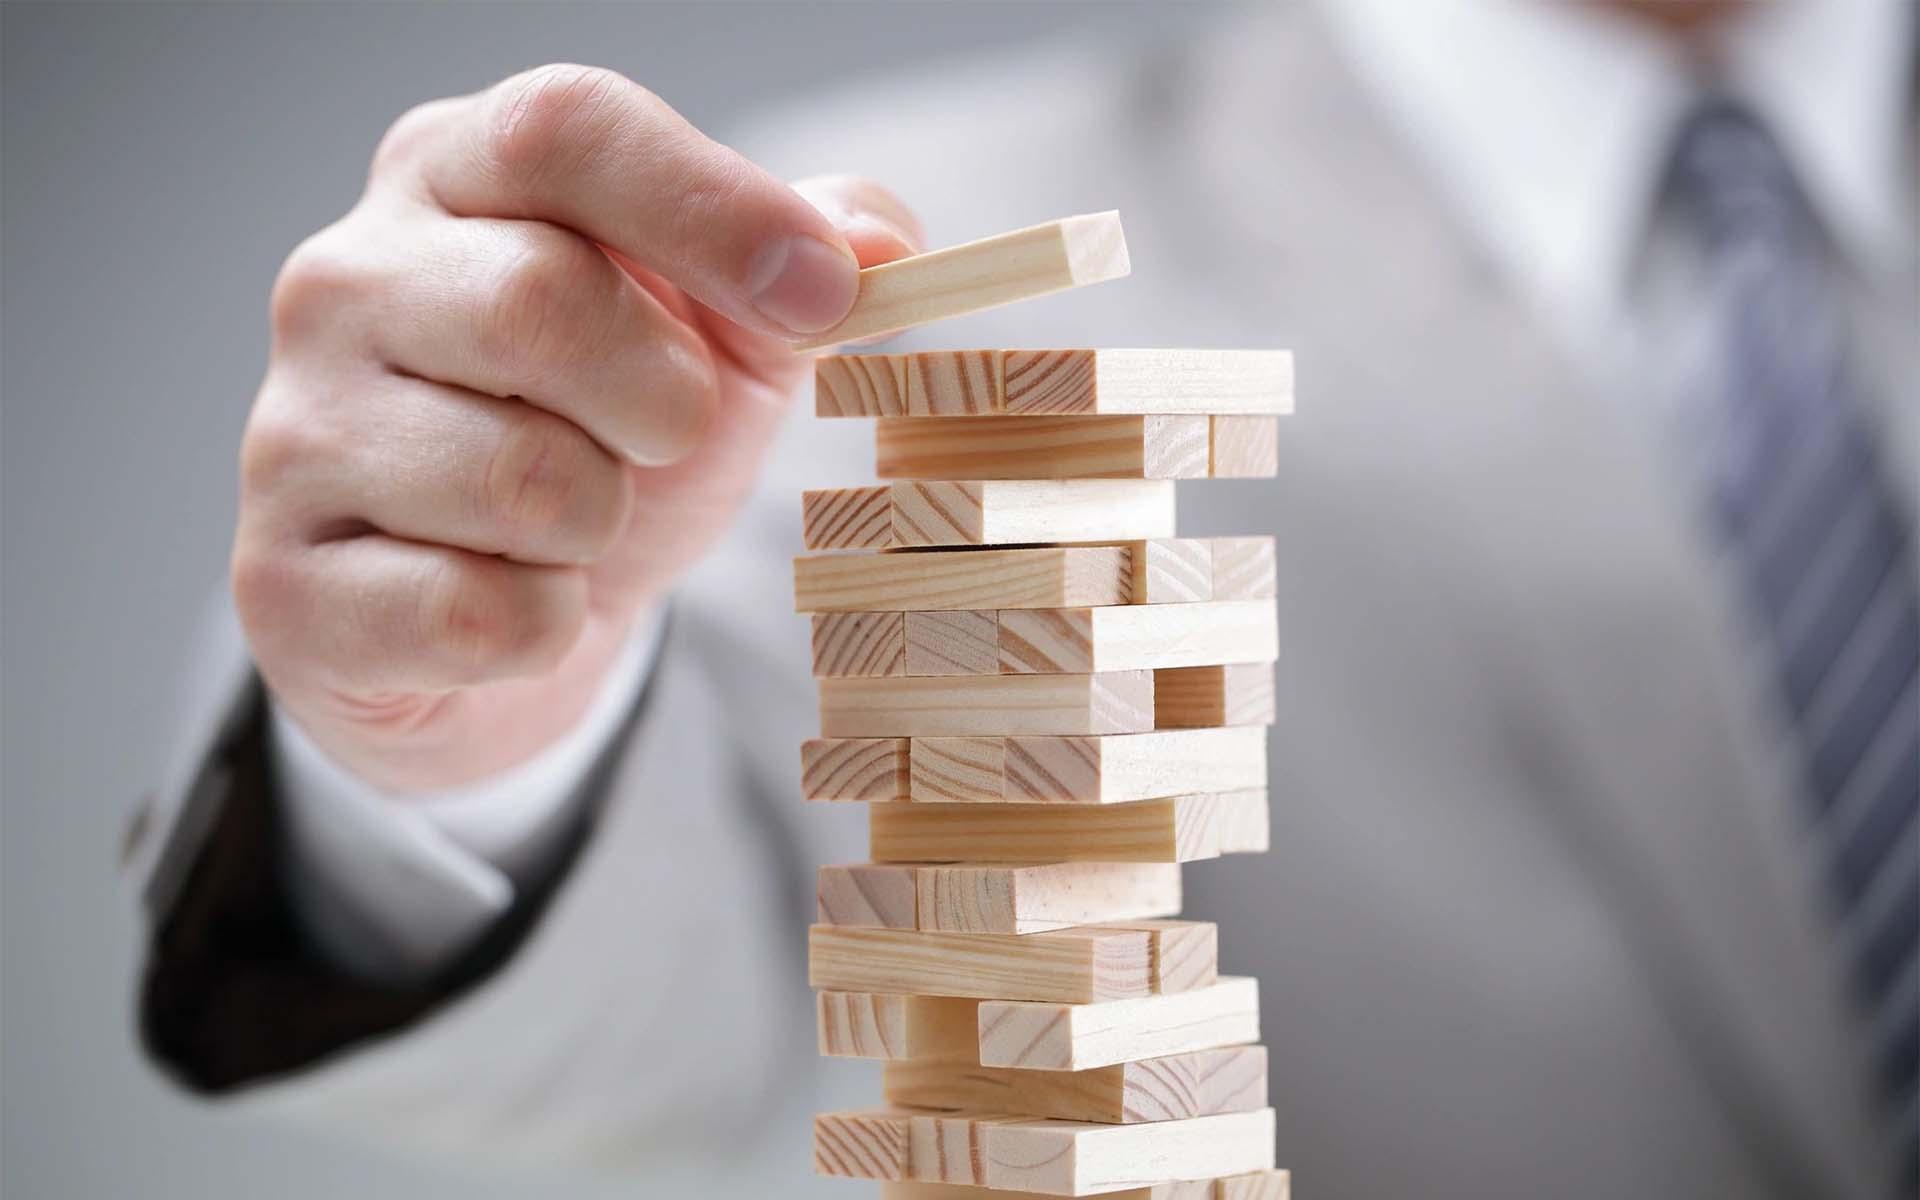 CIO of Hedge Fund BlockTower Capital Reveals 3 Biggest Cryptocurrency Investment Risks